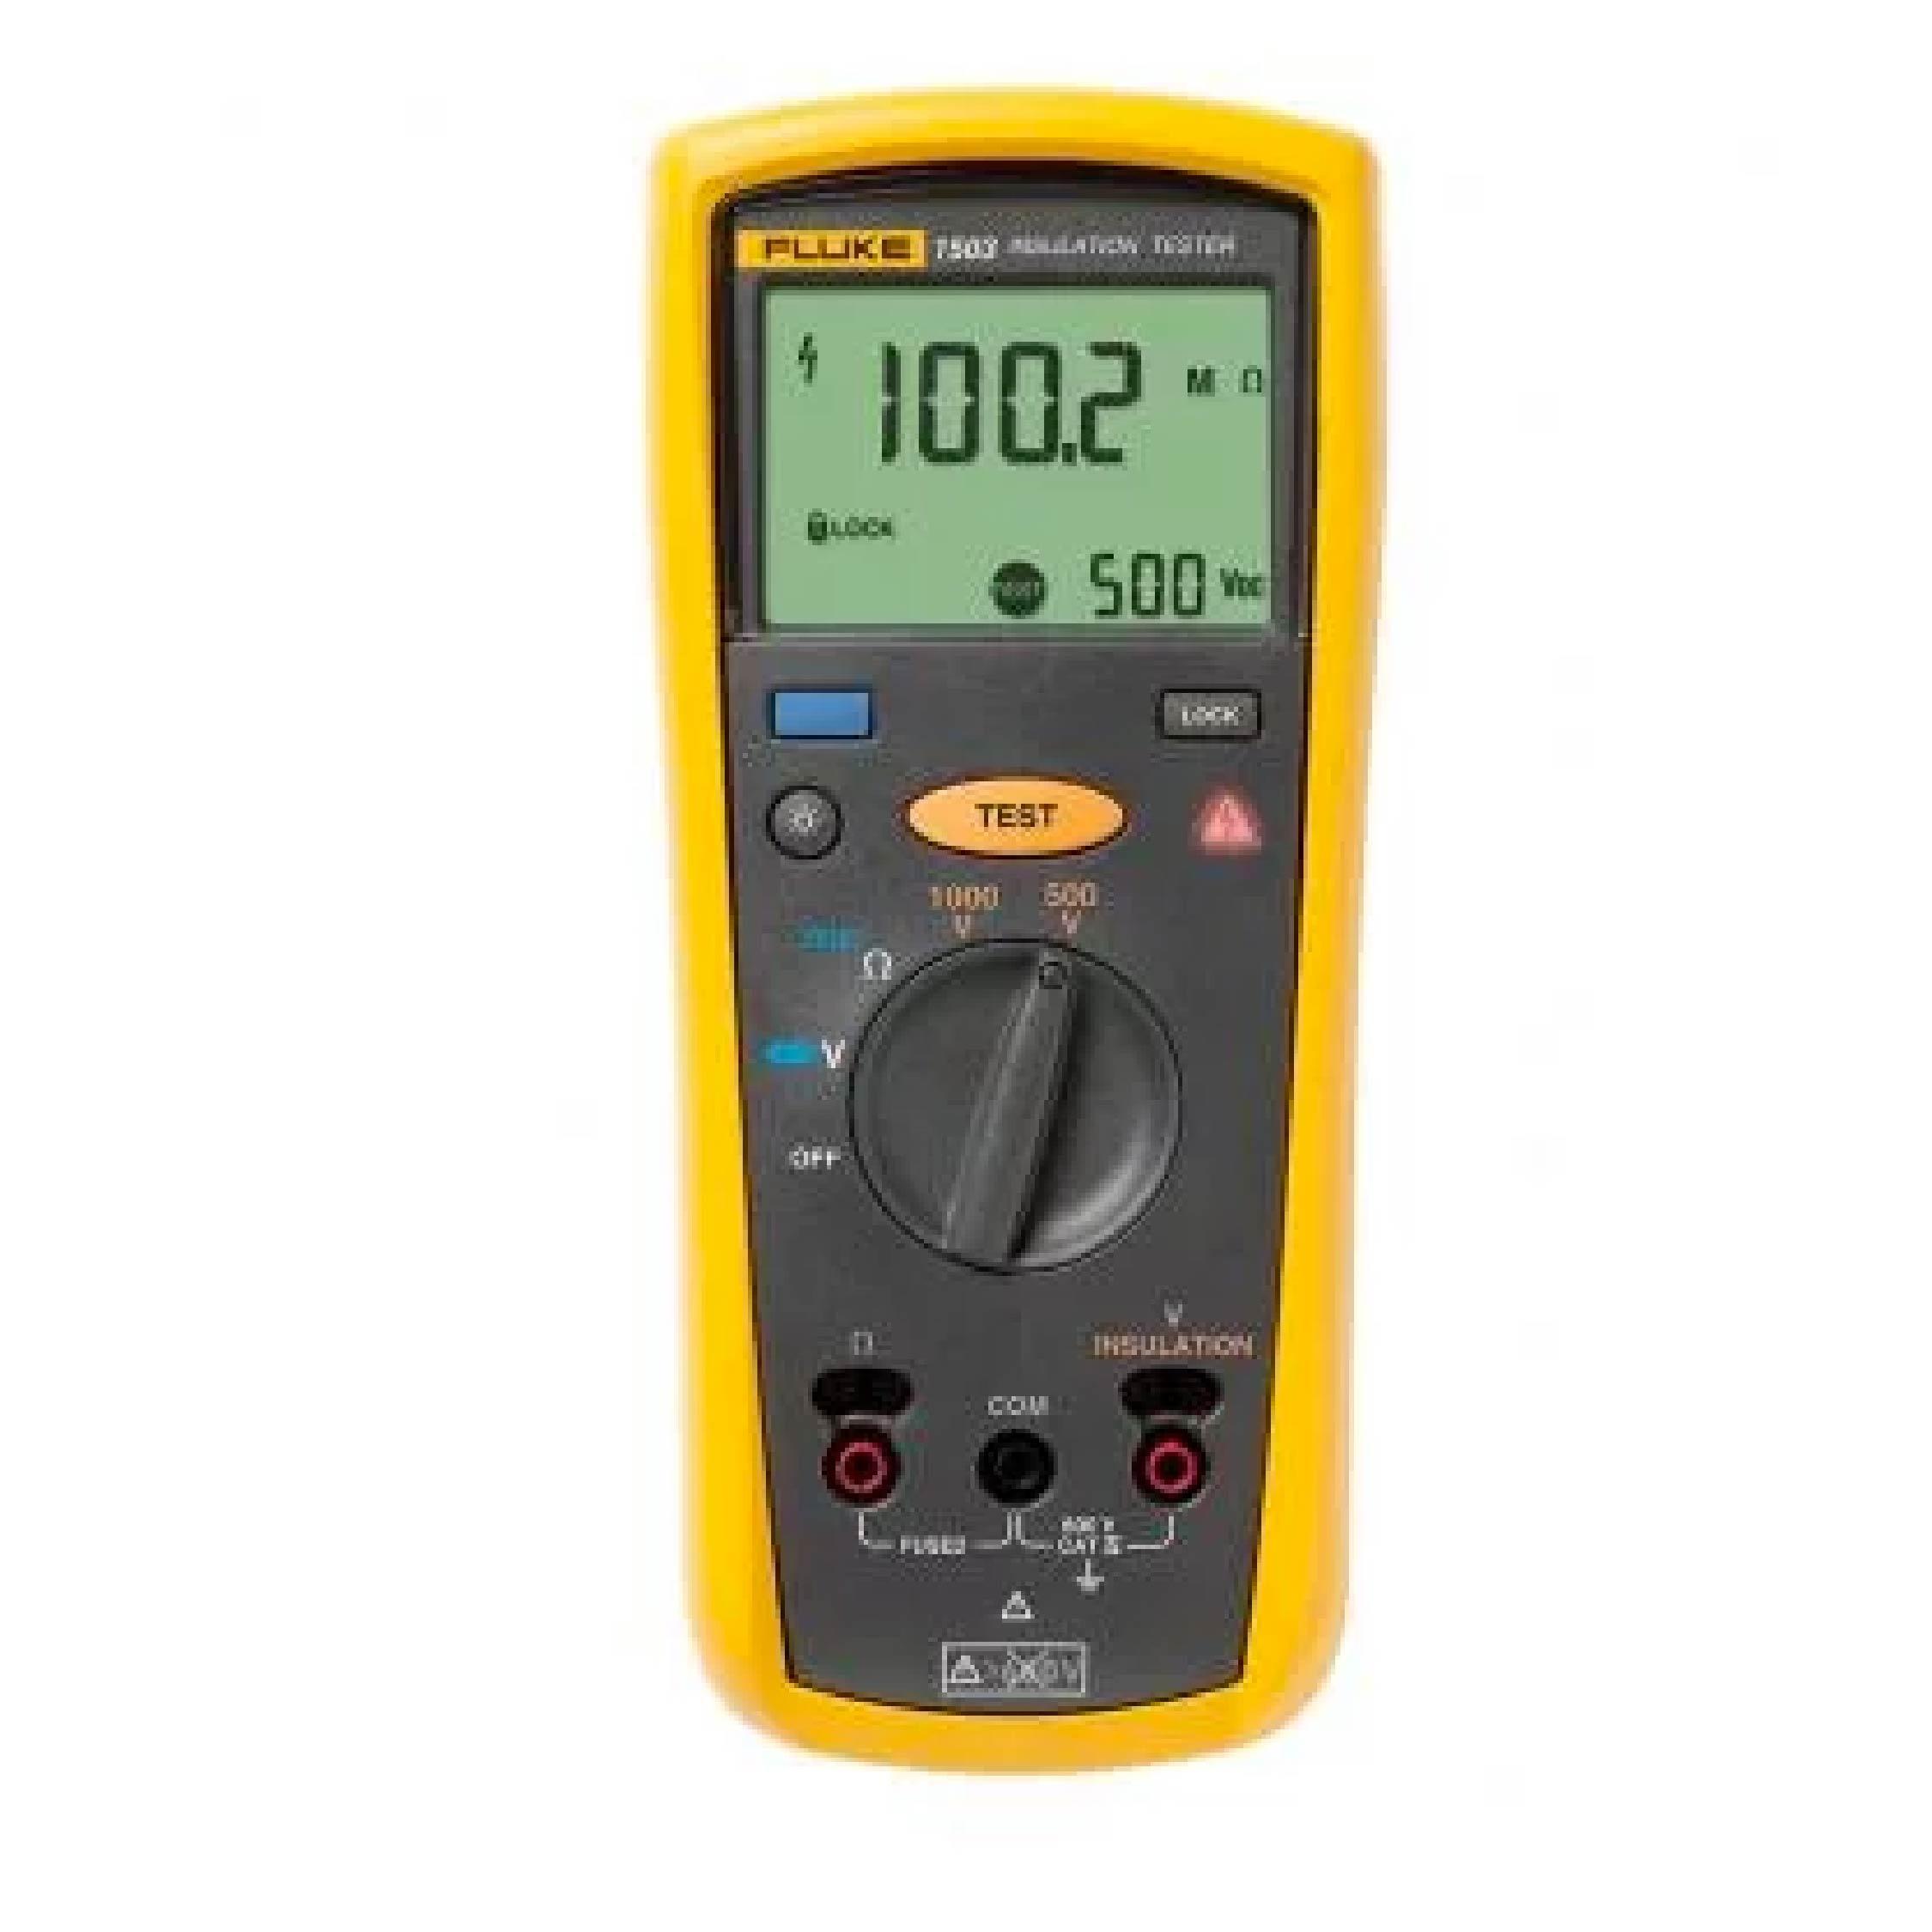 FLUKE 1503 - Insulation Resistance Testers